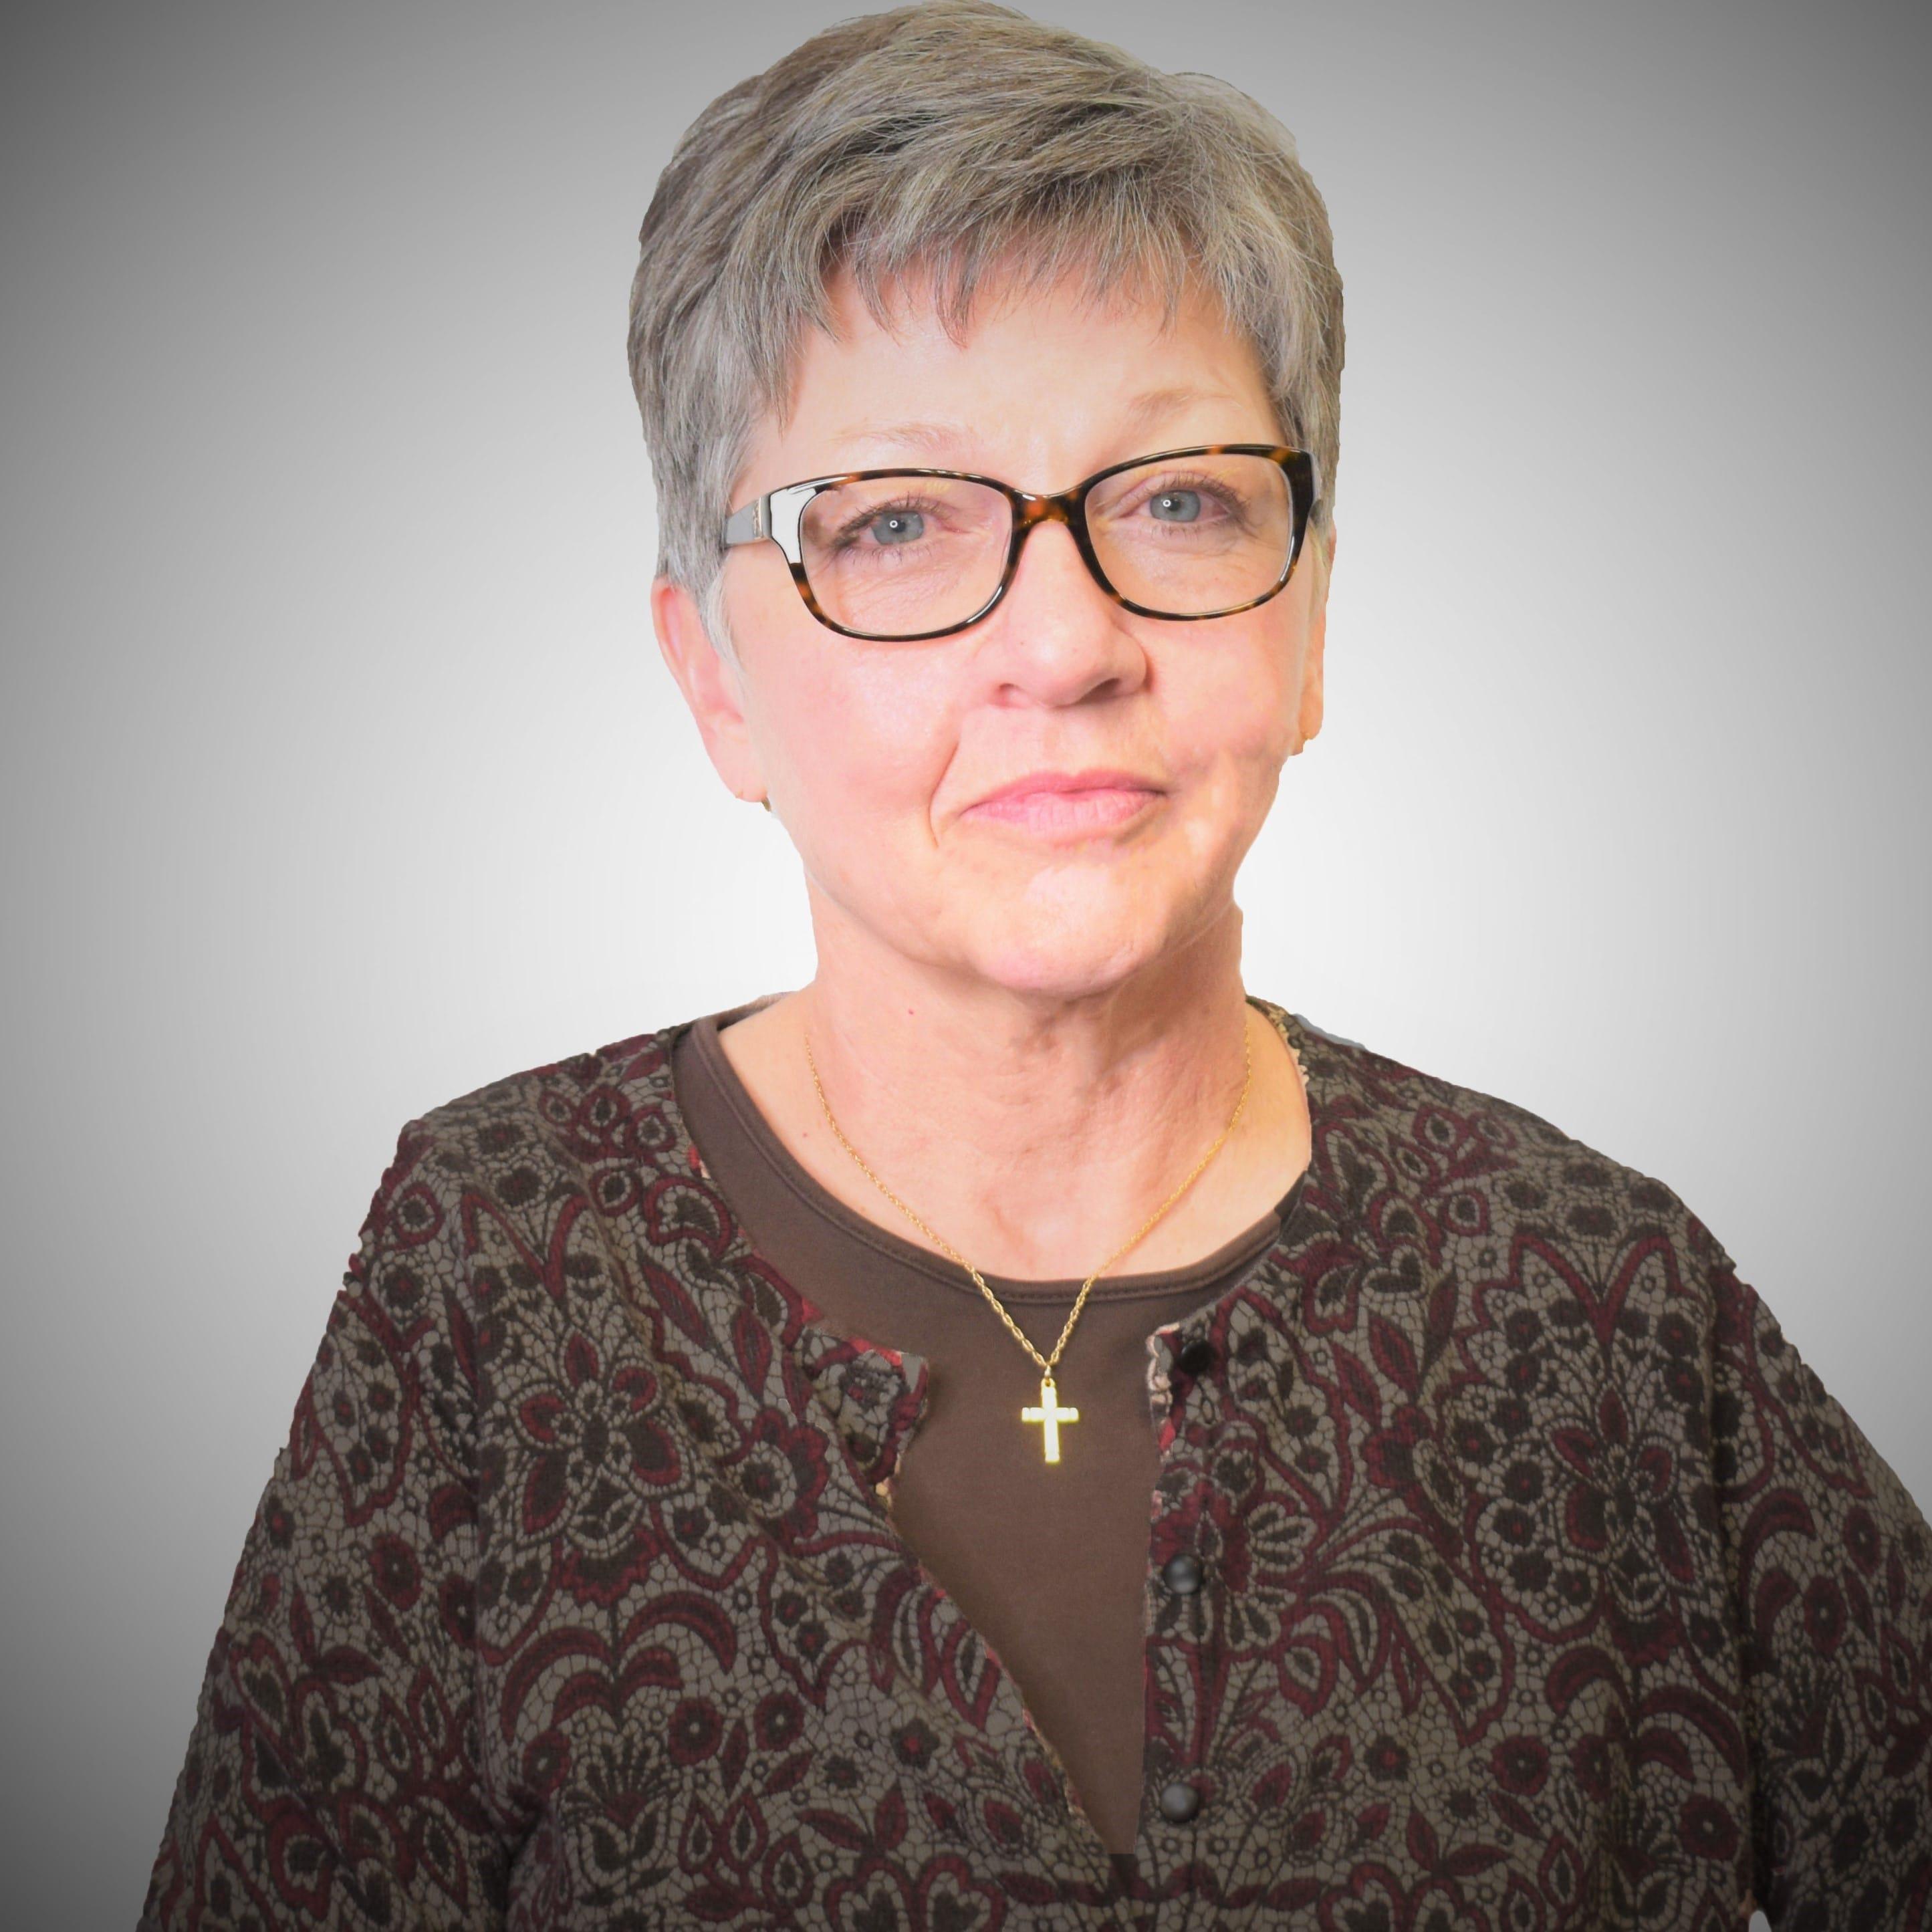 Kimberly Maginn